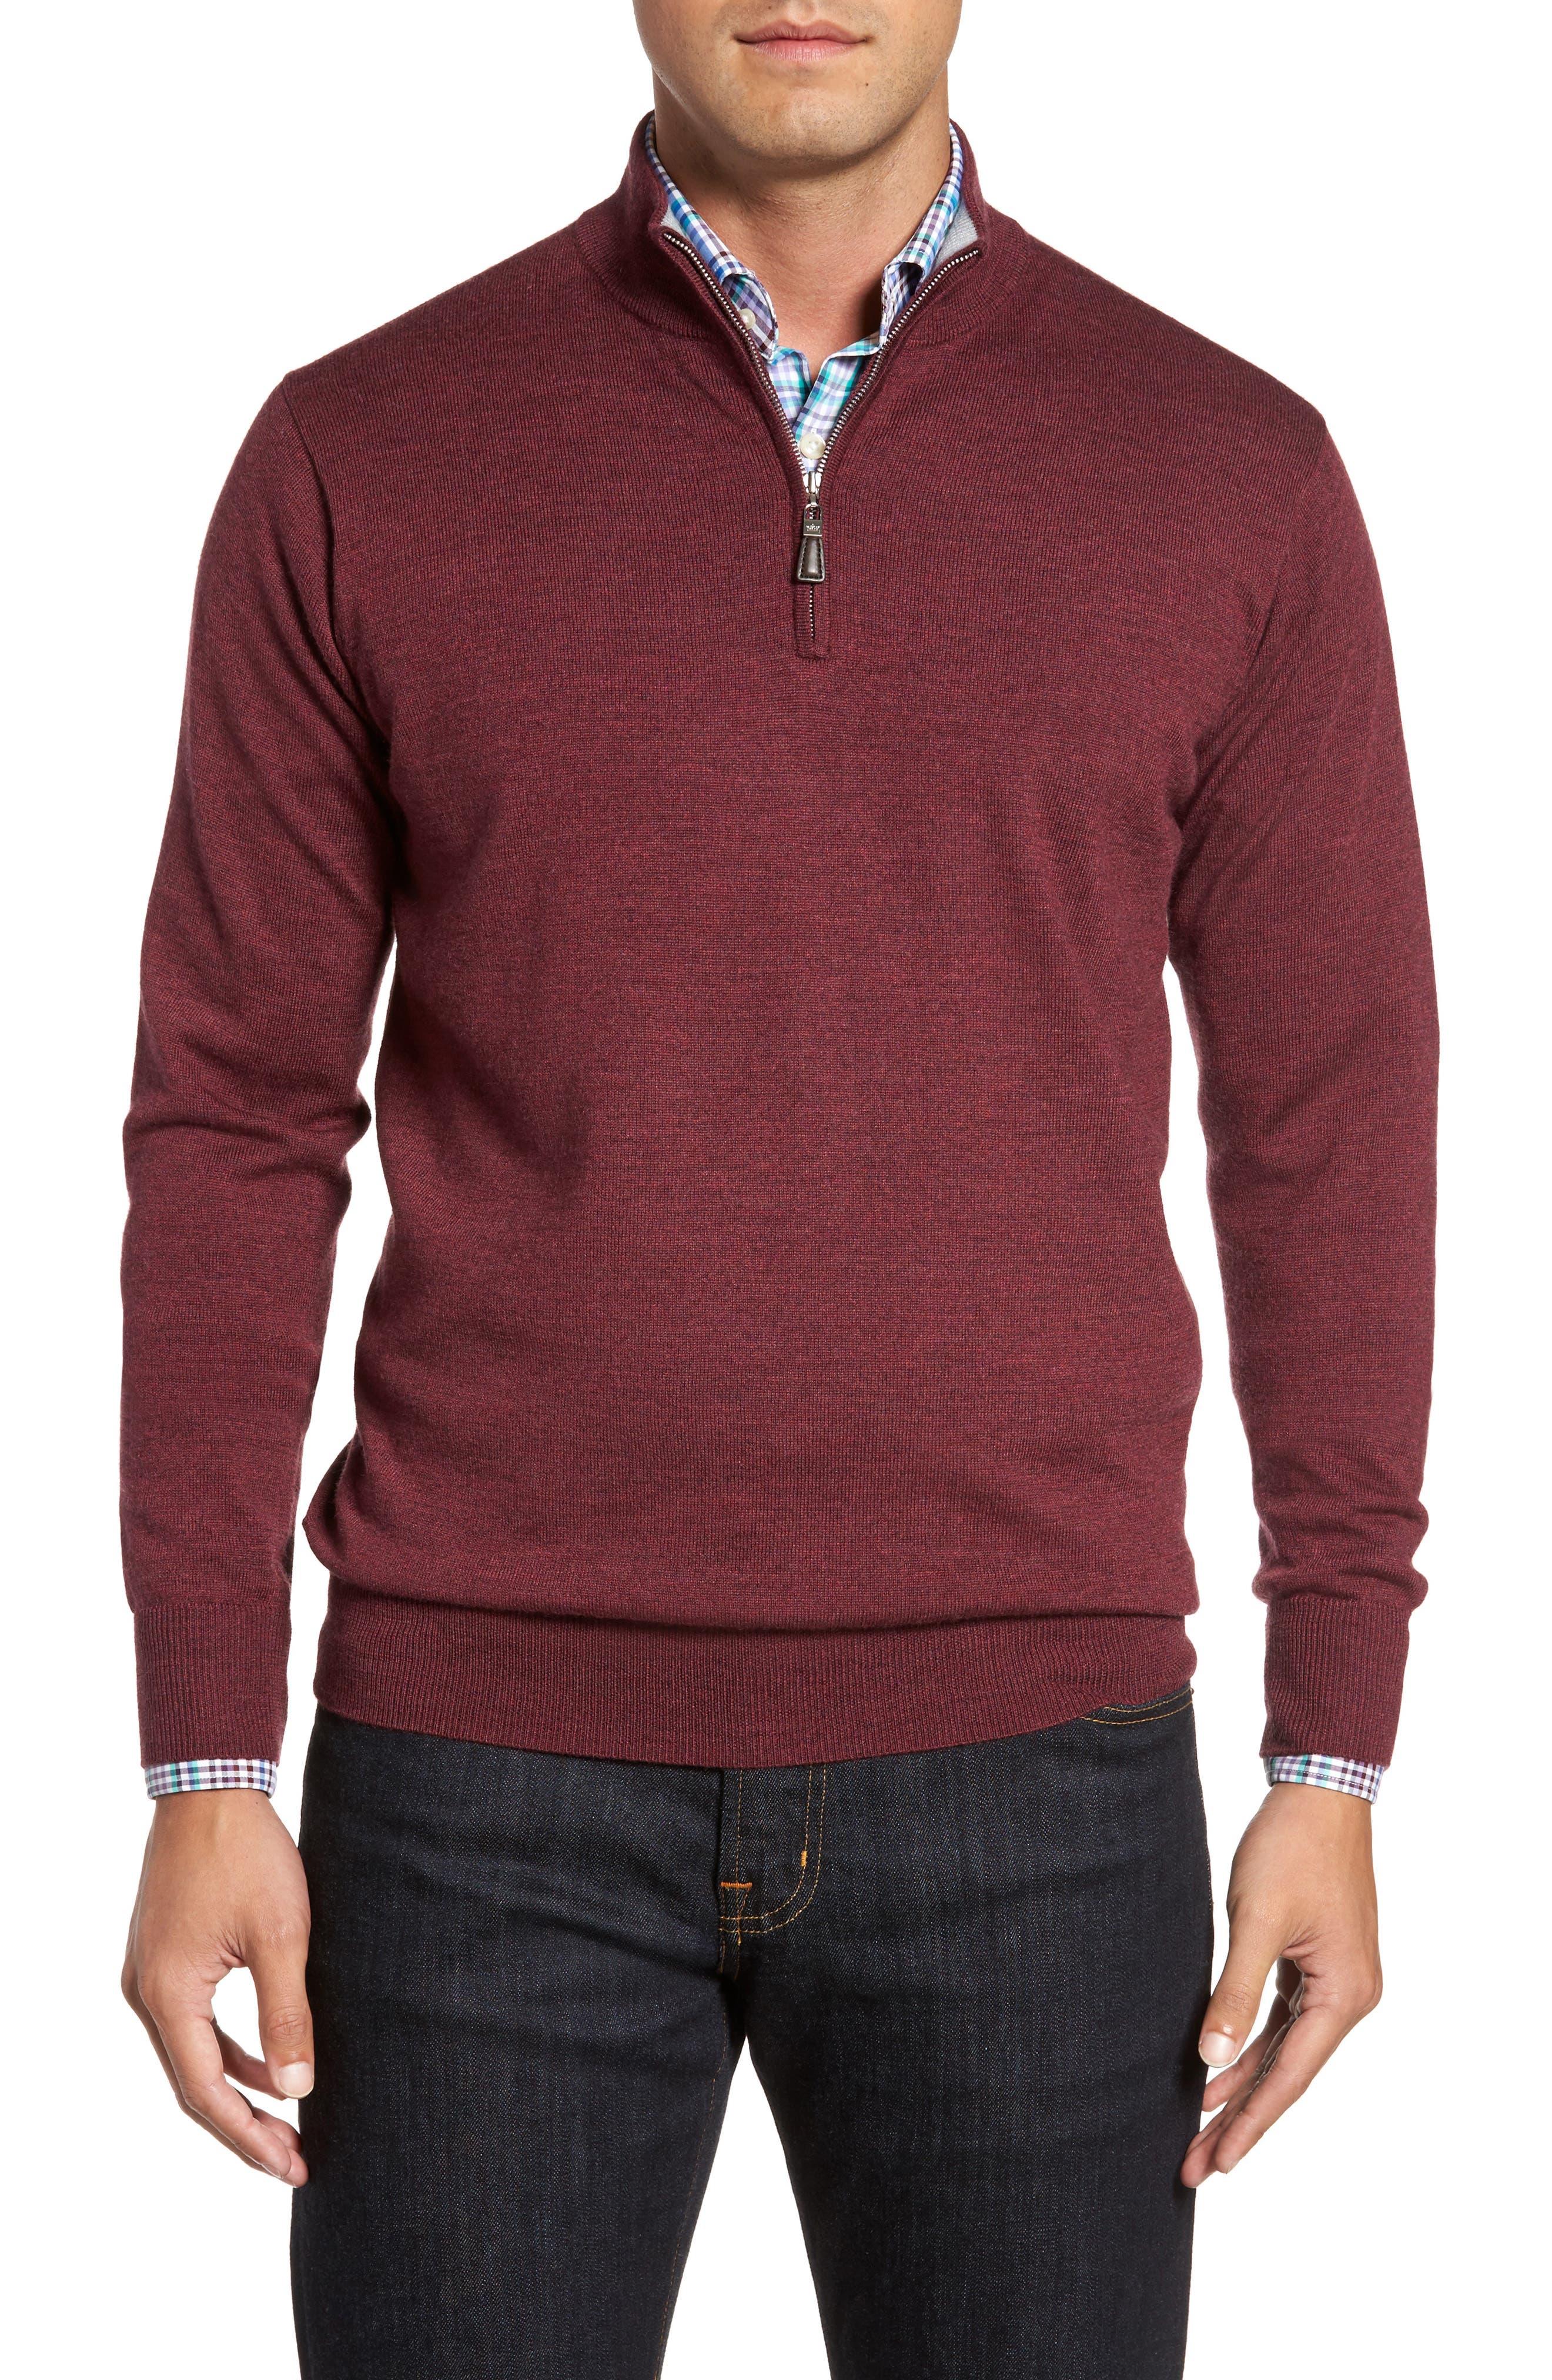 Alternate Image 1 Selected - Peter Millar Crown Soft Merino Blend Quarter Zip Sweater